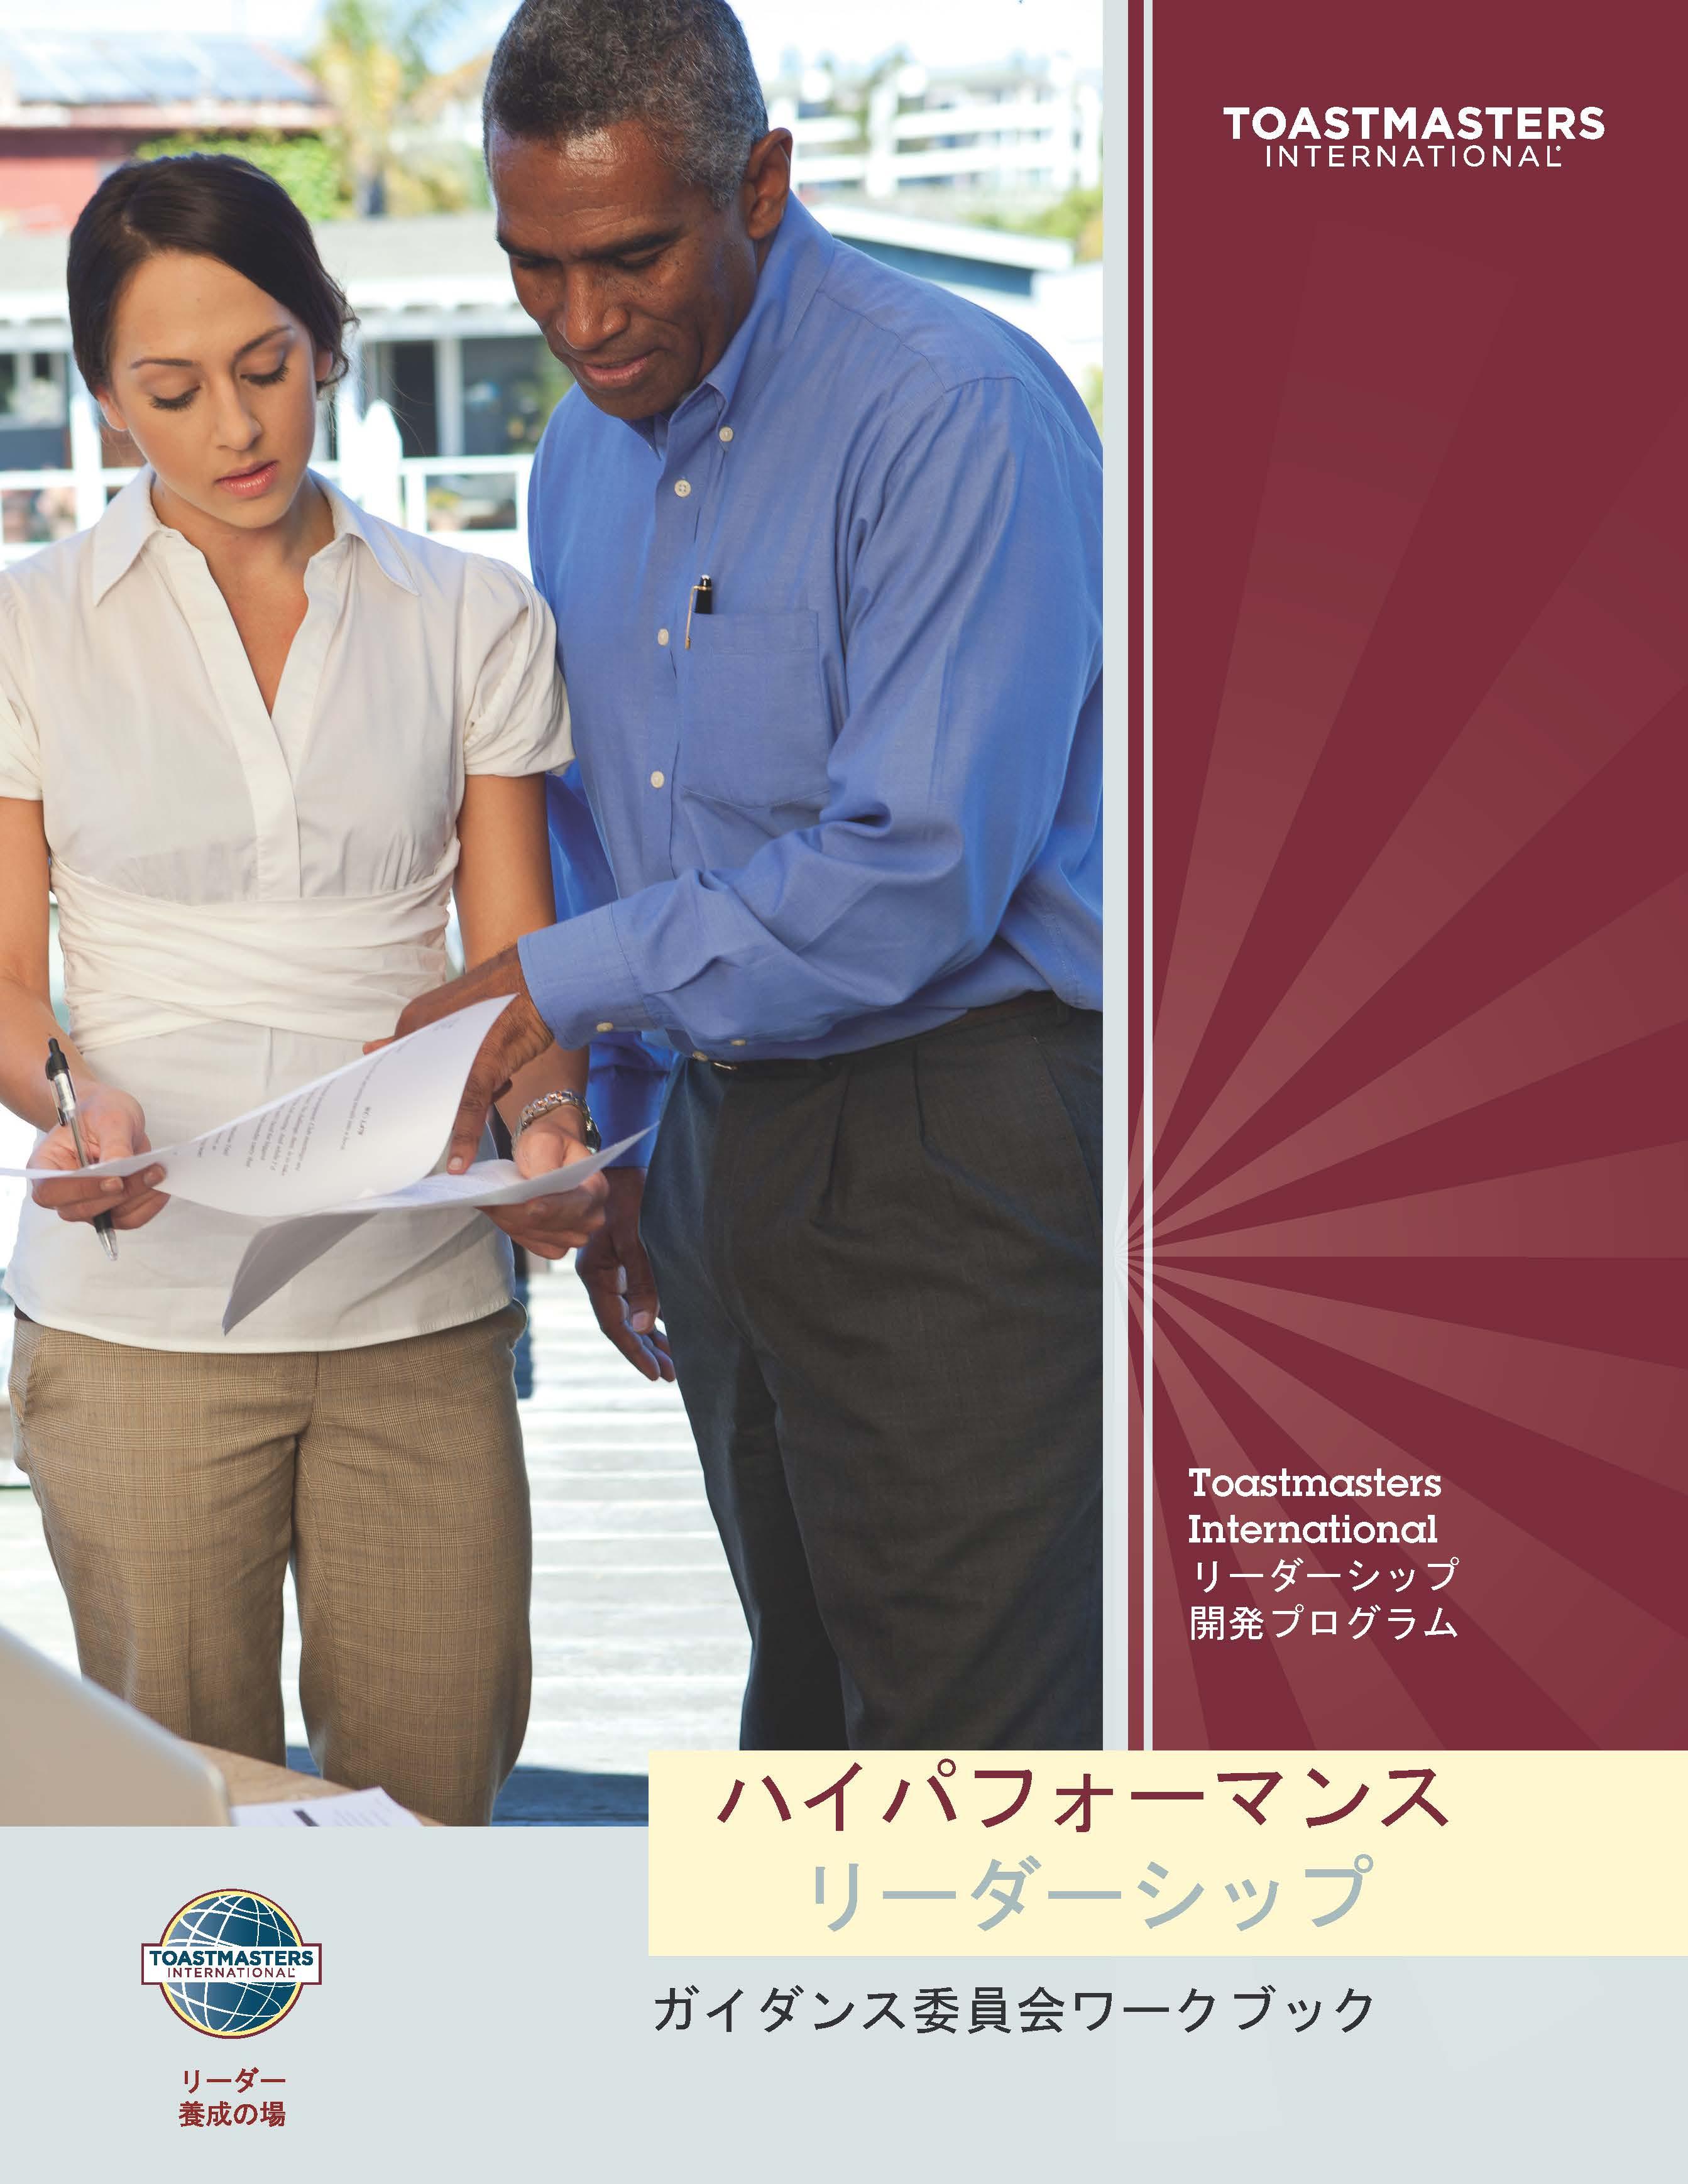 High Performance Leadership: Guidance Committee Workbook (Japanese)